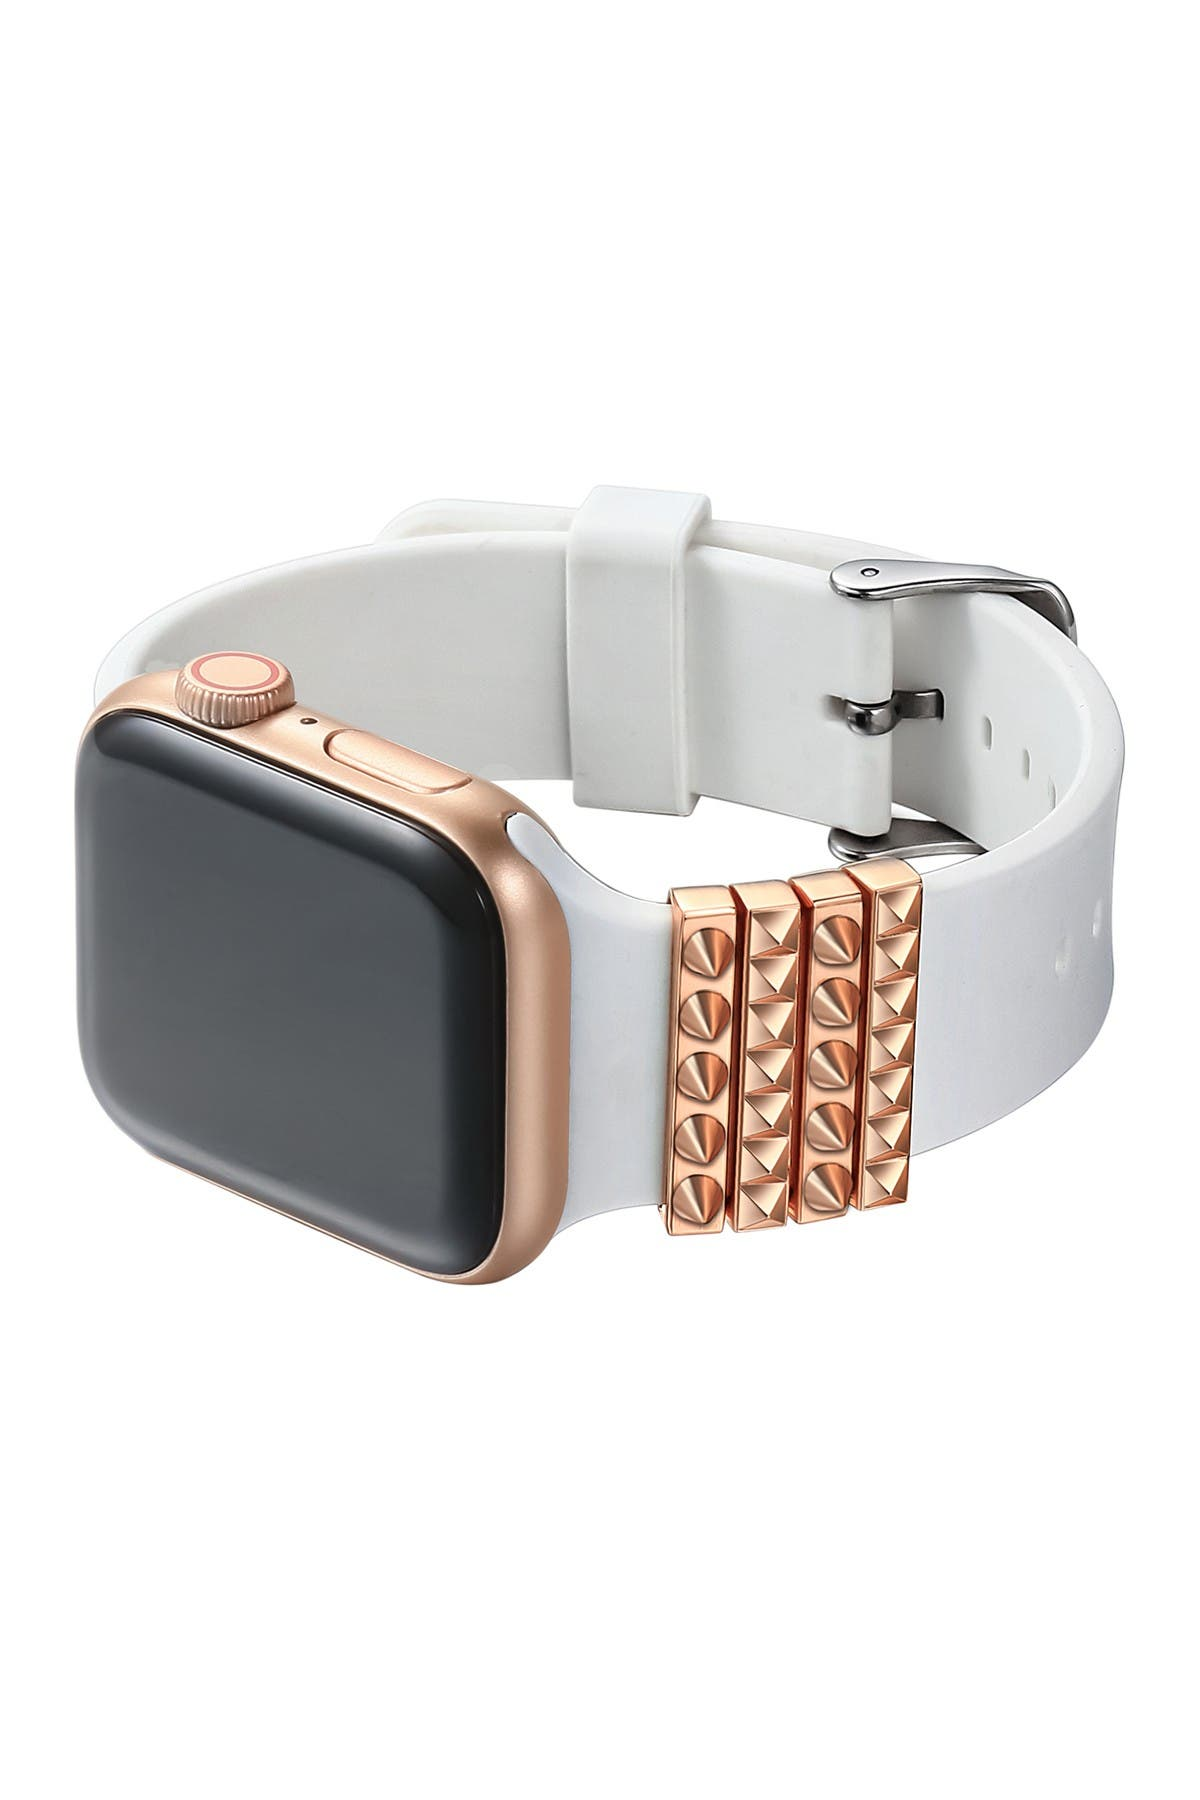 Posh Tech Rose Gold Apple Watch Band Charm Set Of 4 Nordstrom Rack